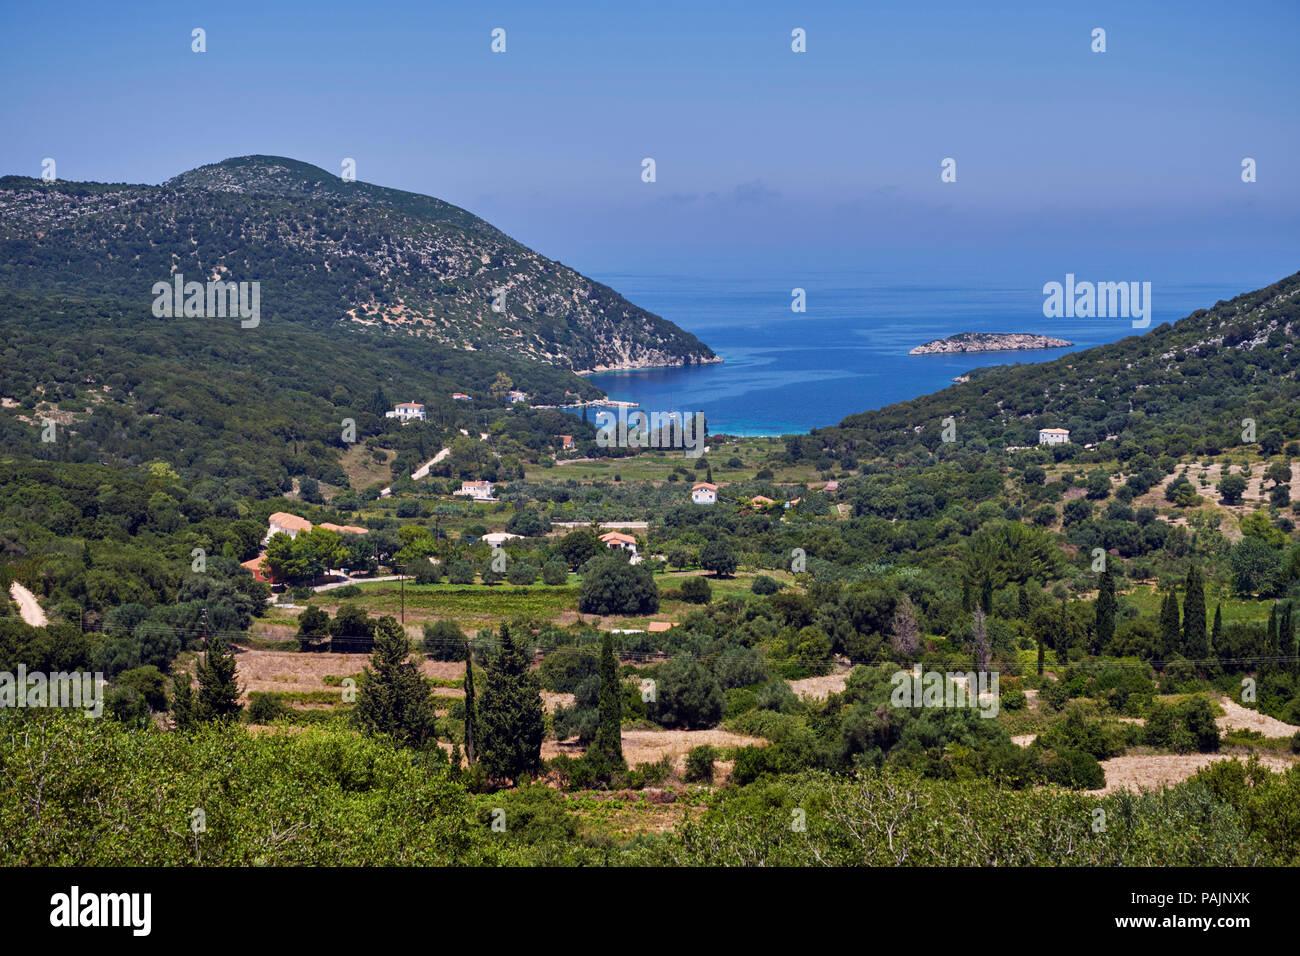 Atheras Bay on the Paliki Peninsula. Cephalonia, Ionian Islands, Greece. - Stock Image